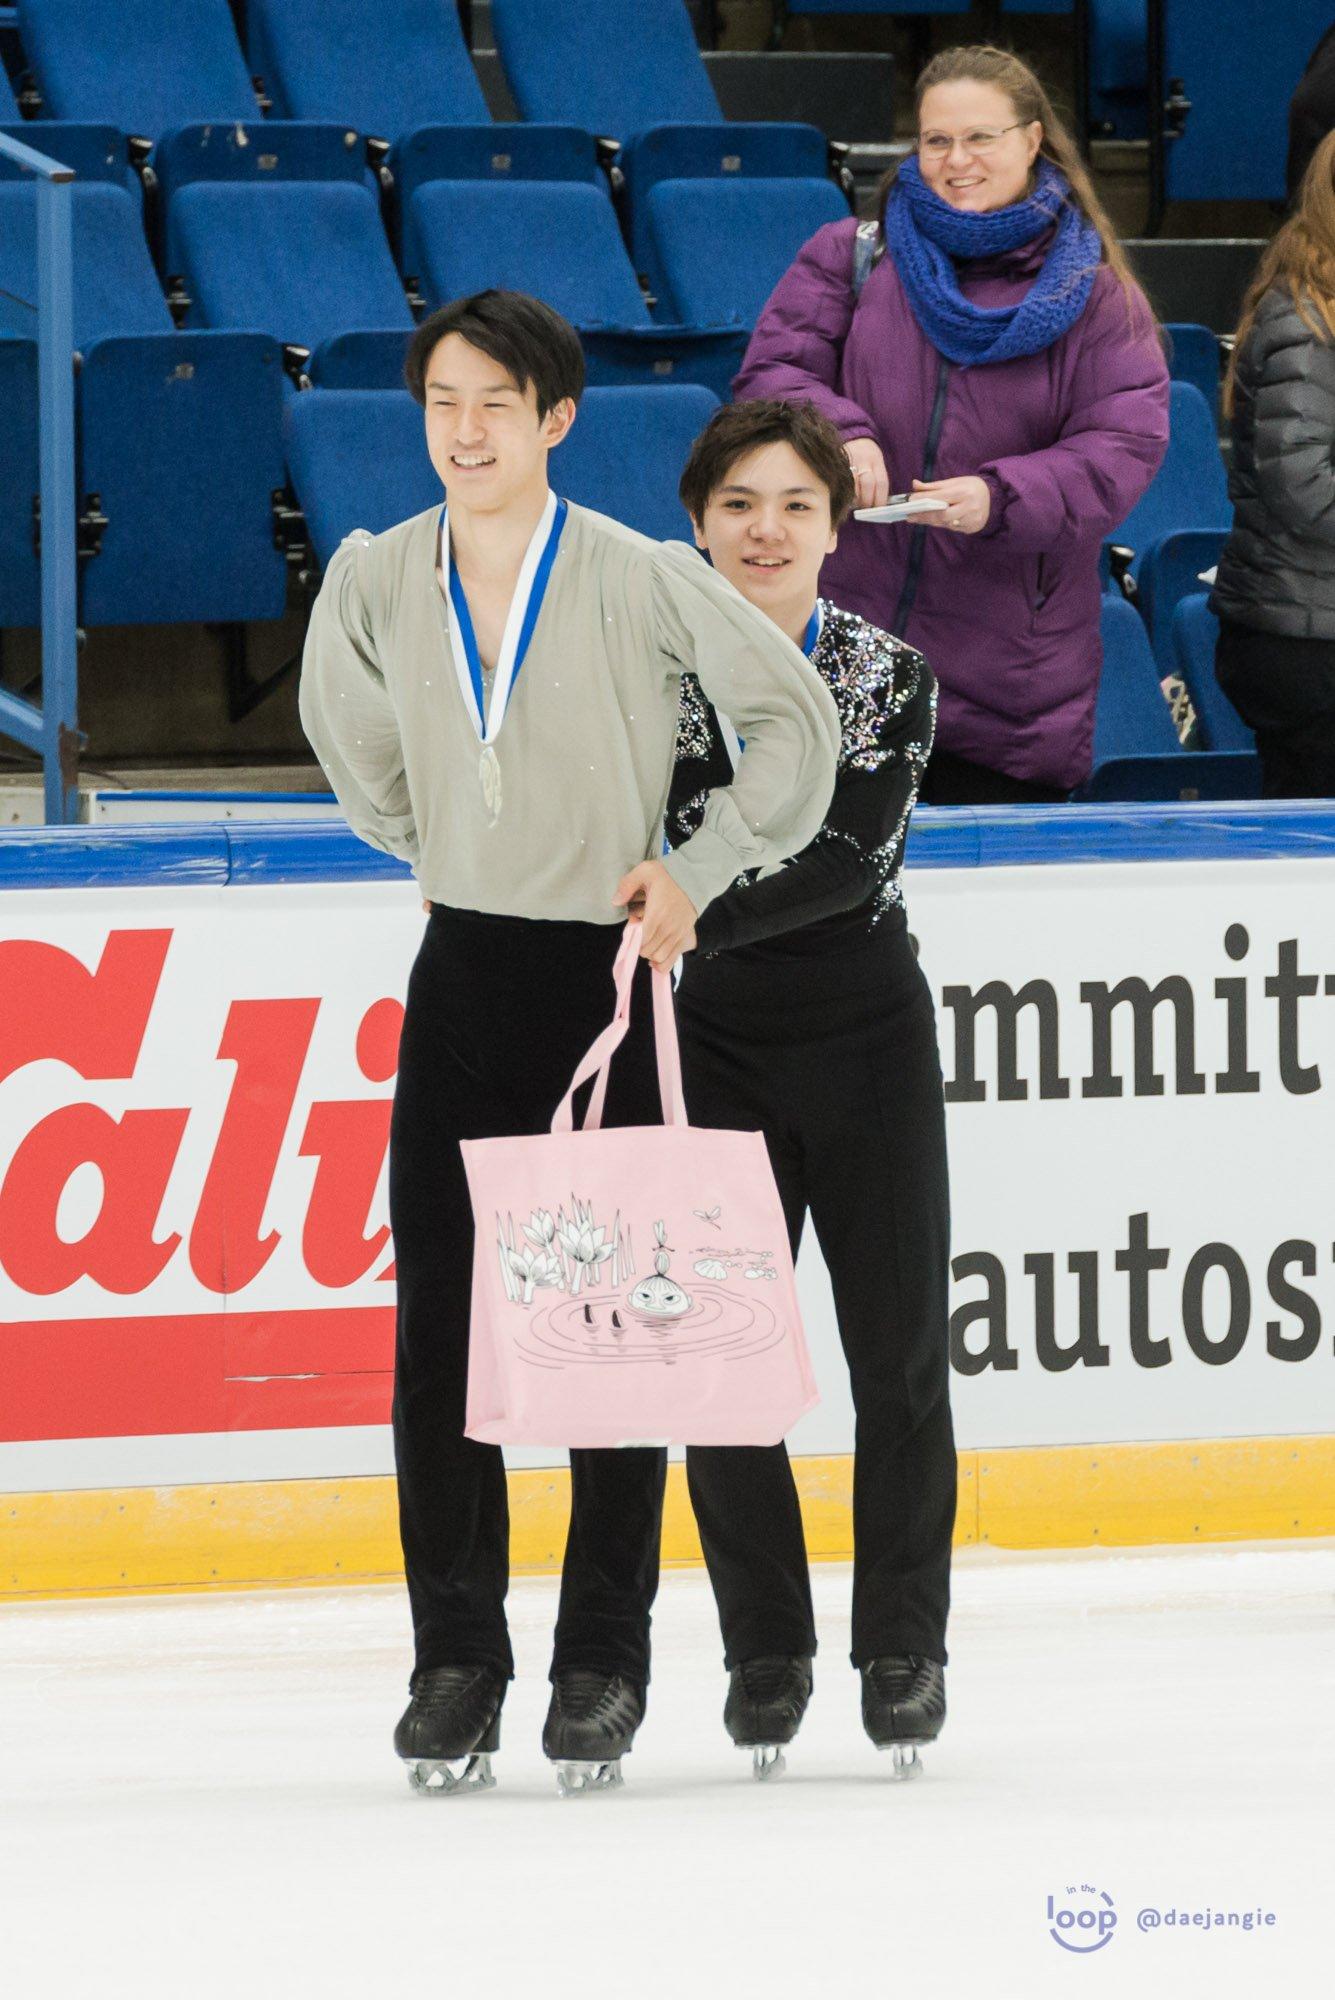 Challenger (6) - Finlandia Trophy. Oct 11 - 13, 2019. Espoo /FIN      - Страница 10 EGvZP5jWkAA_BOy?format=jpg&name=large